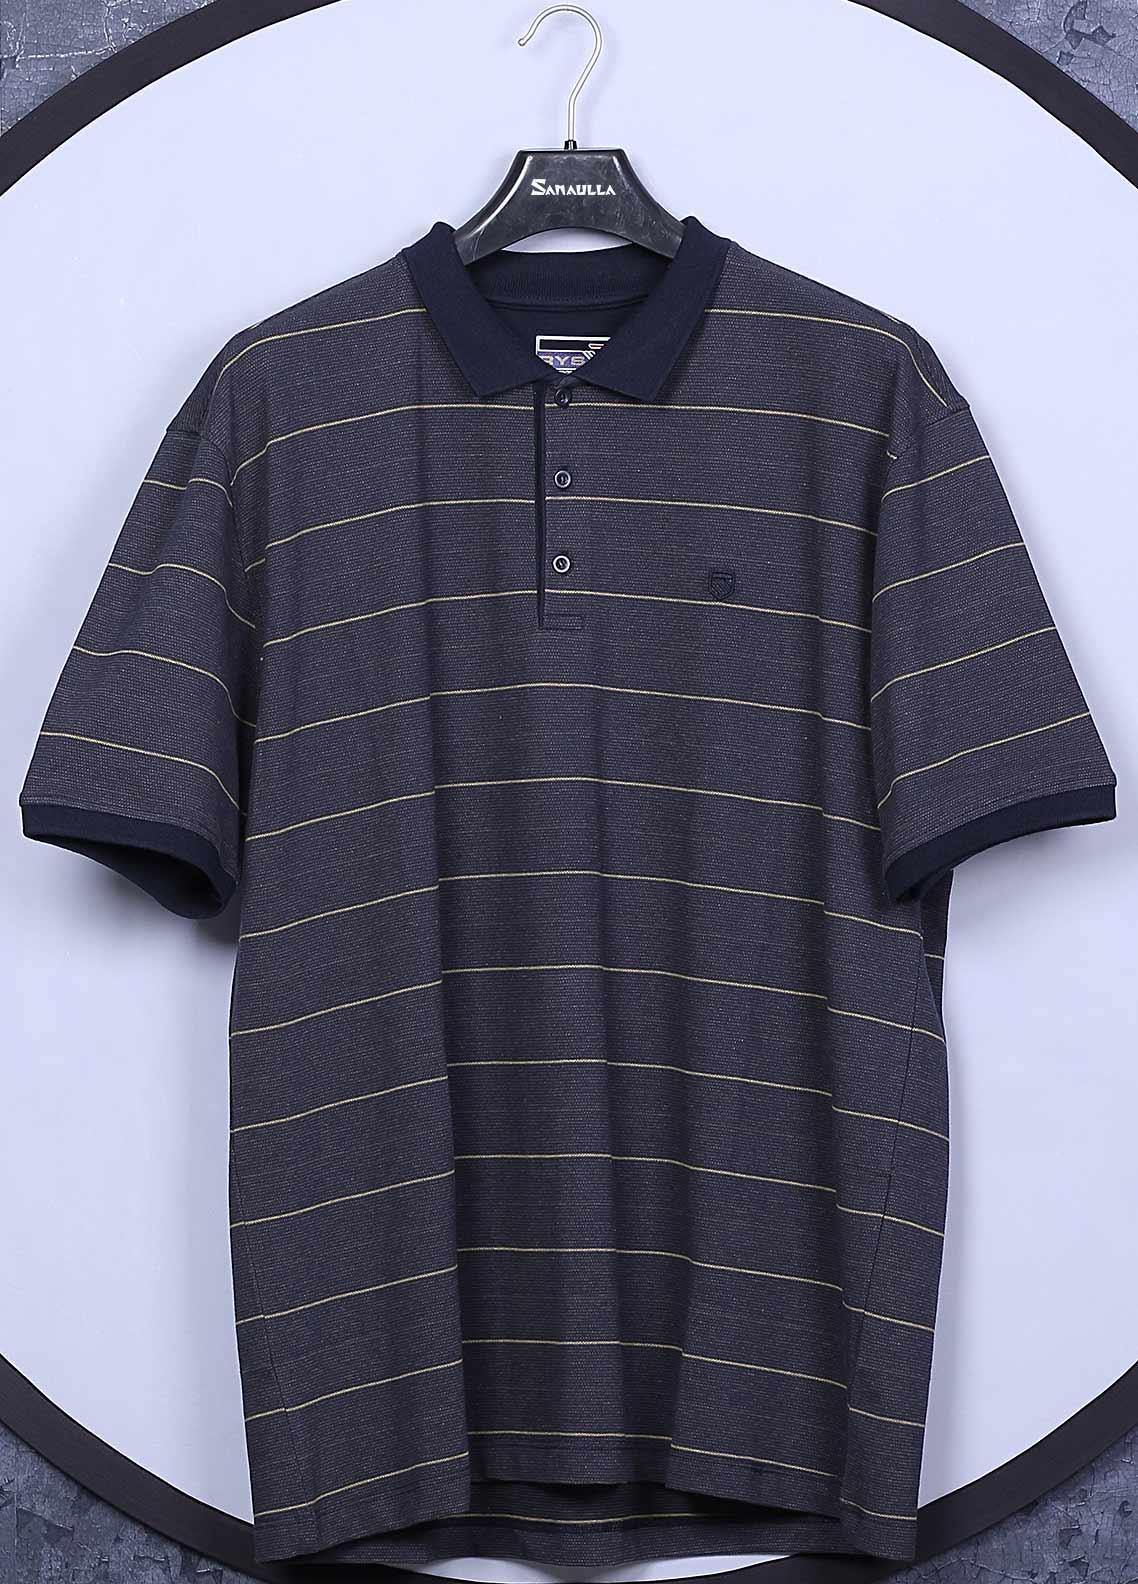 Sanaulla Exclusive Range Cotton Casual T-Shirts for Men -  5060 Navy Blue